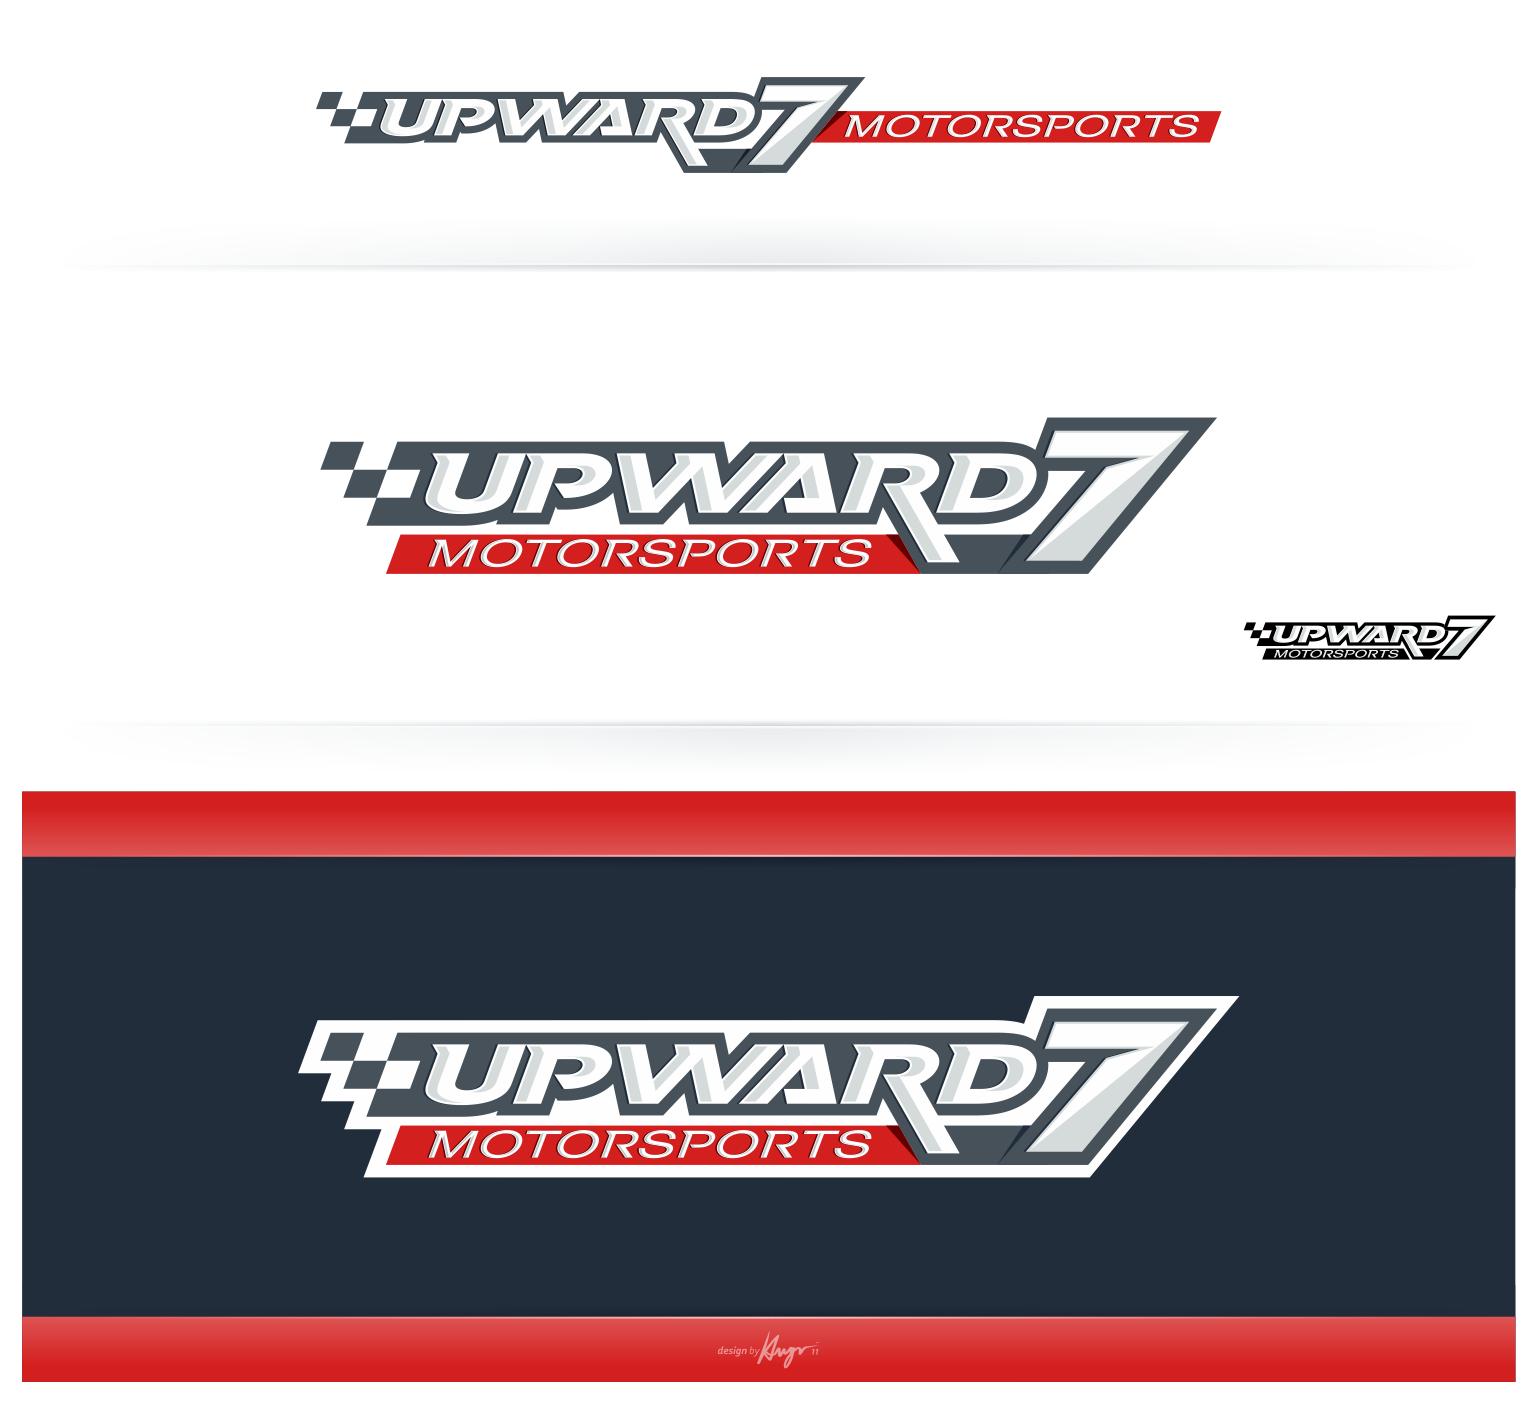 Create the next logo for Upward7 Motorsports